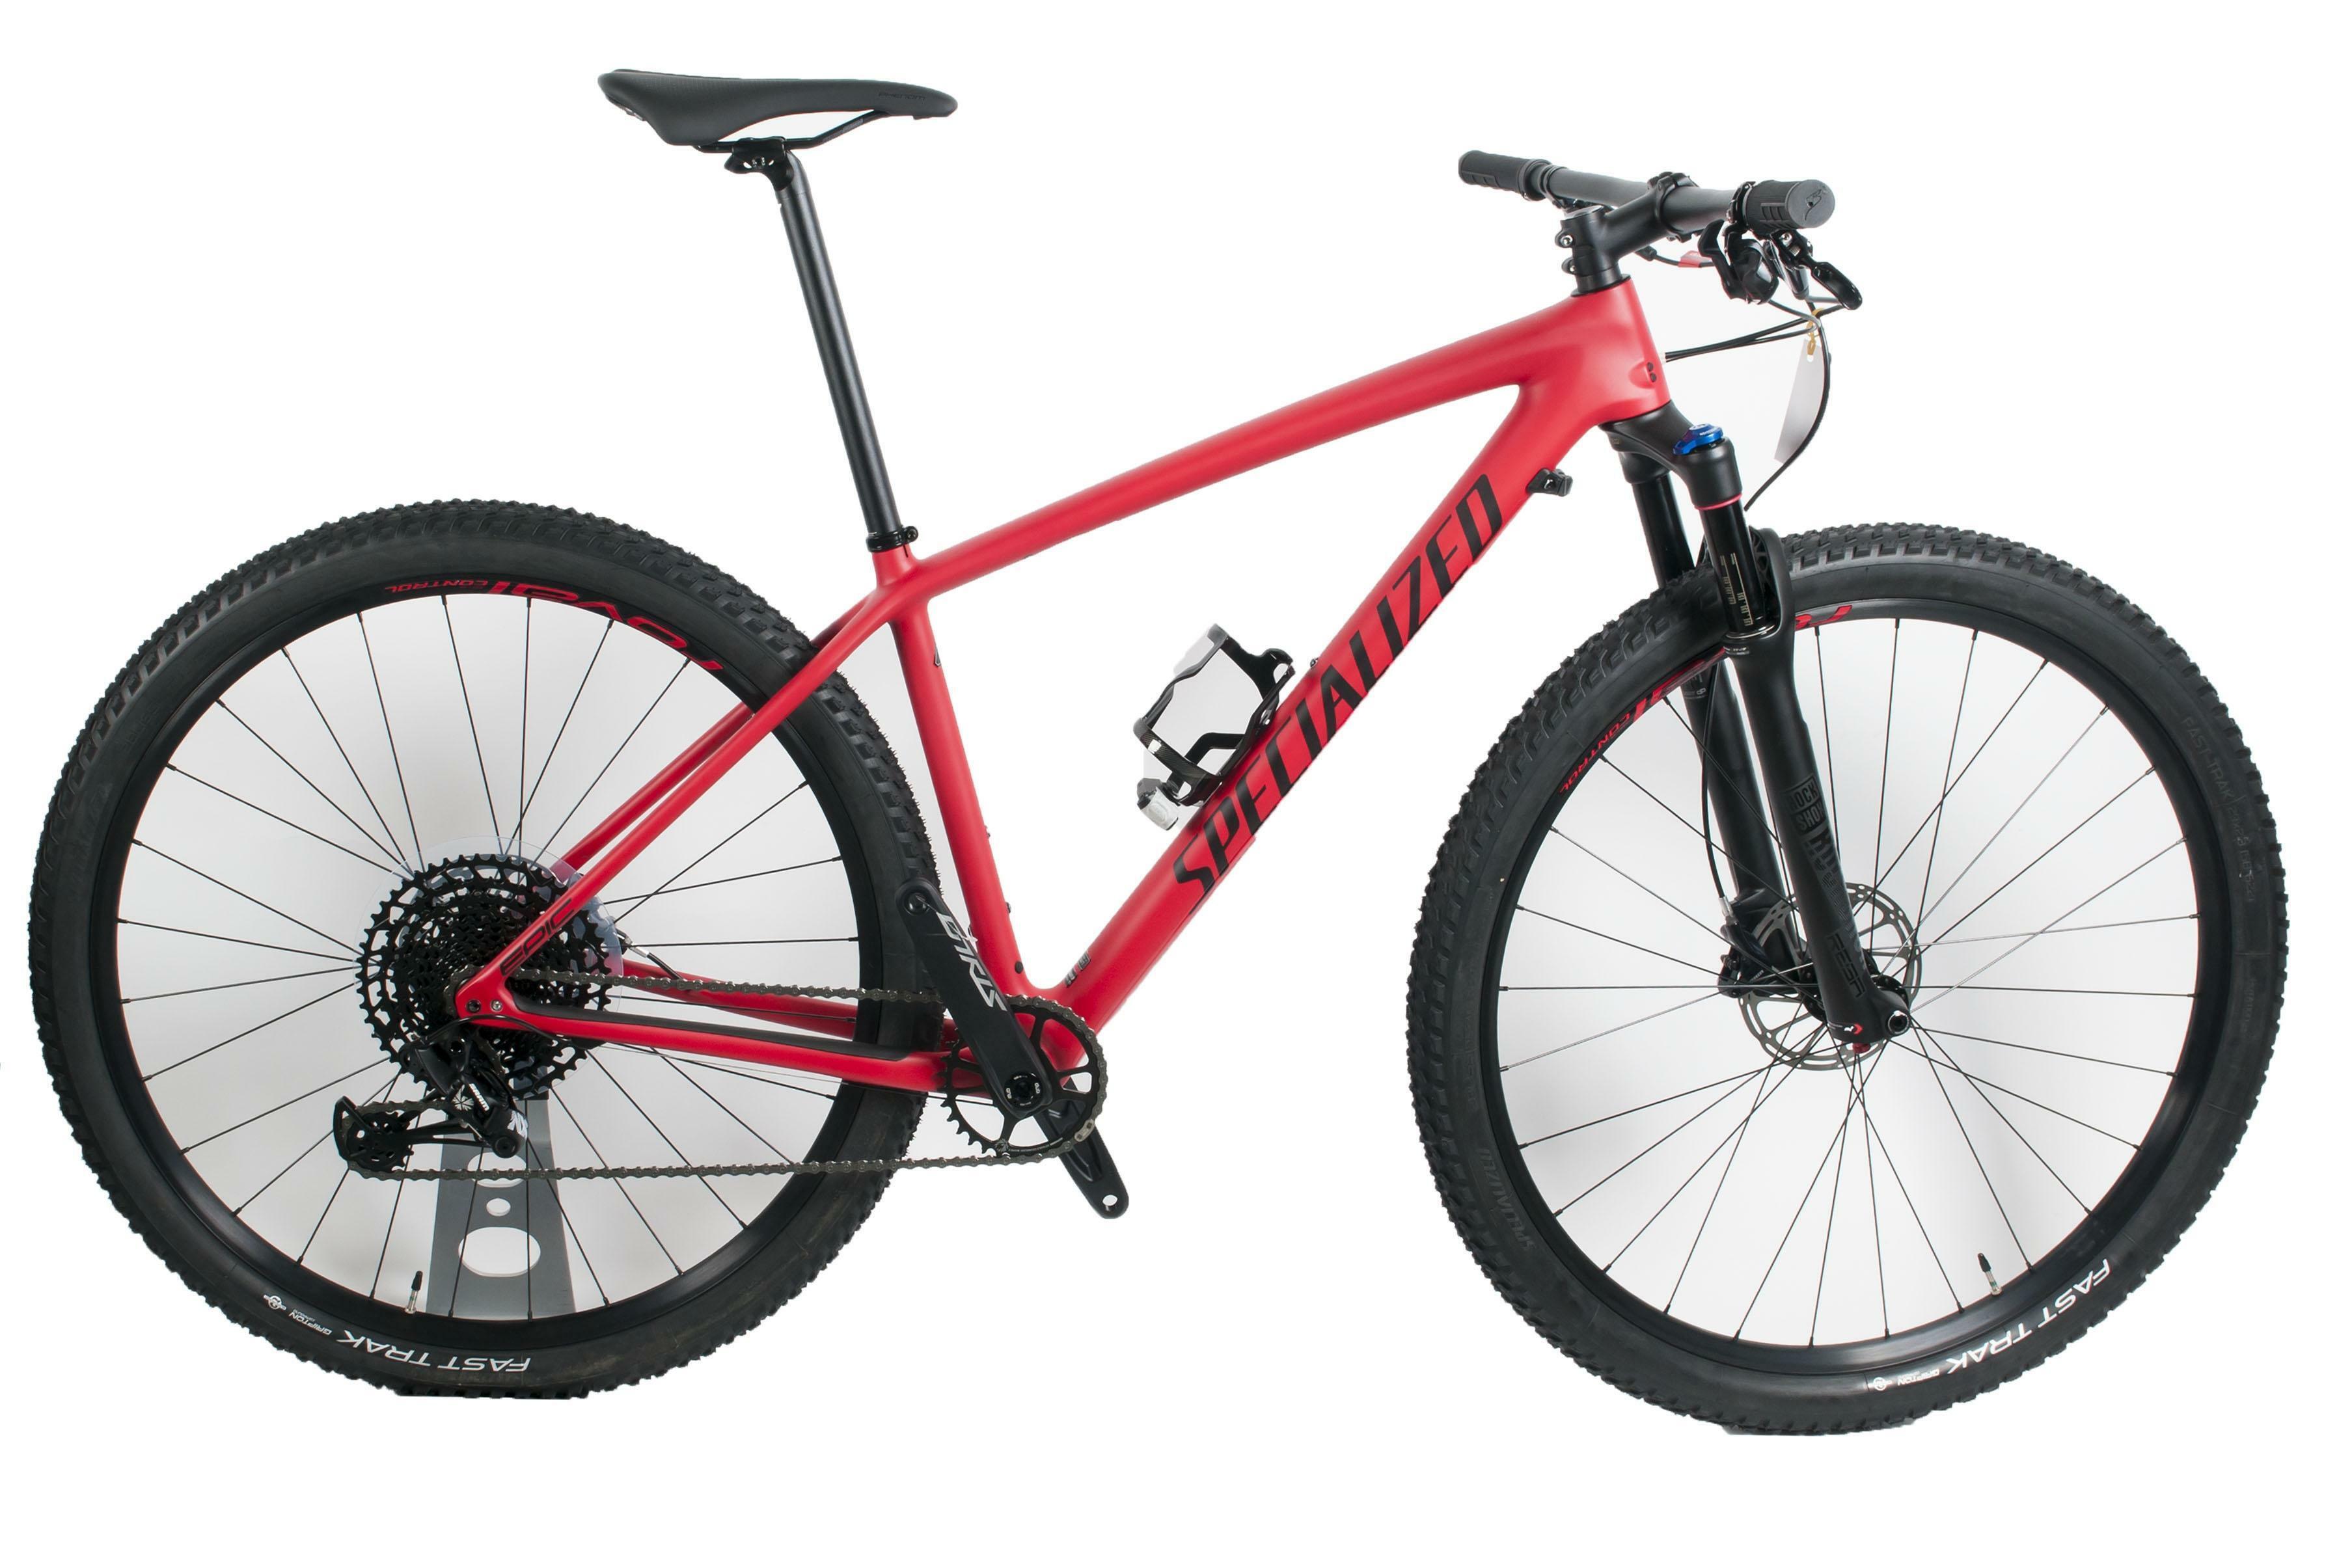 specialized specialized bici mtb epic hardtrail comp carbon